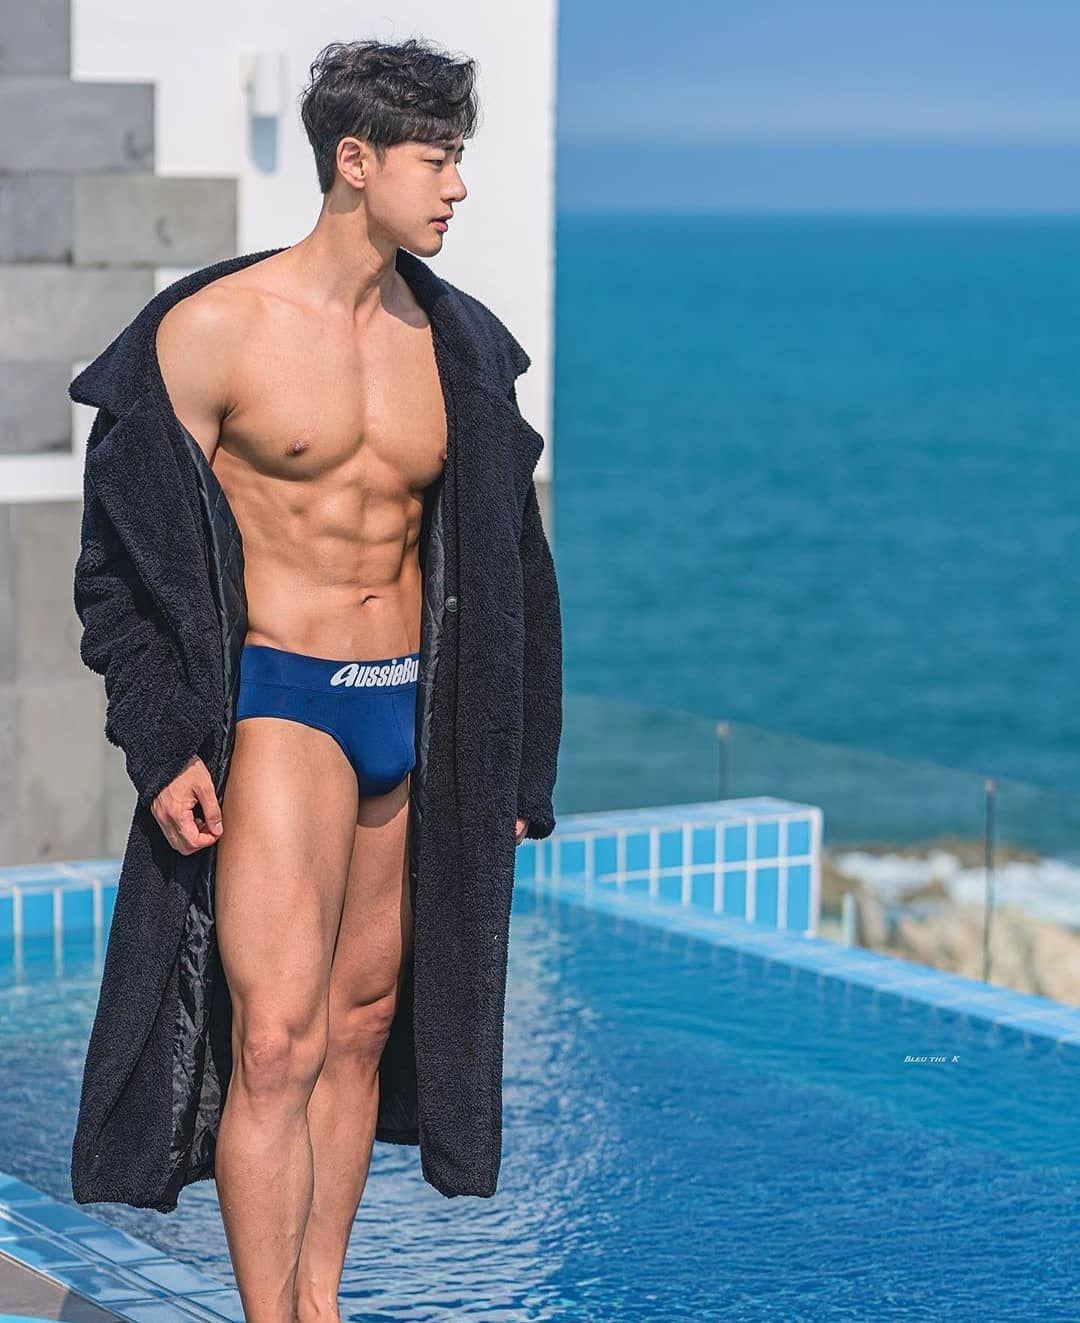 ", Hothunk Korea's Instagram profile post: ""? KOREAN HOT HUNK ?  Super Hot - @insaneaura by @bleu_the_k #fitnessmodel #model #fitness #hothunk #hothunkasia #abs #model #muscle…"", Hot Models Blog 2020, Hot Models Blog 2020"